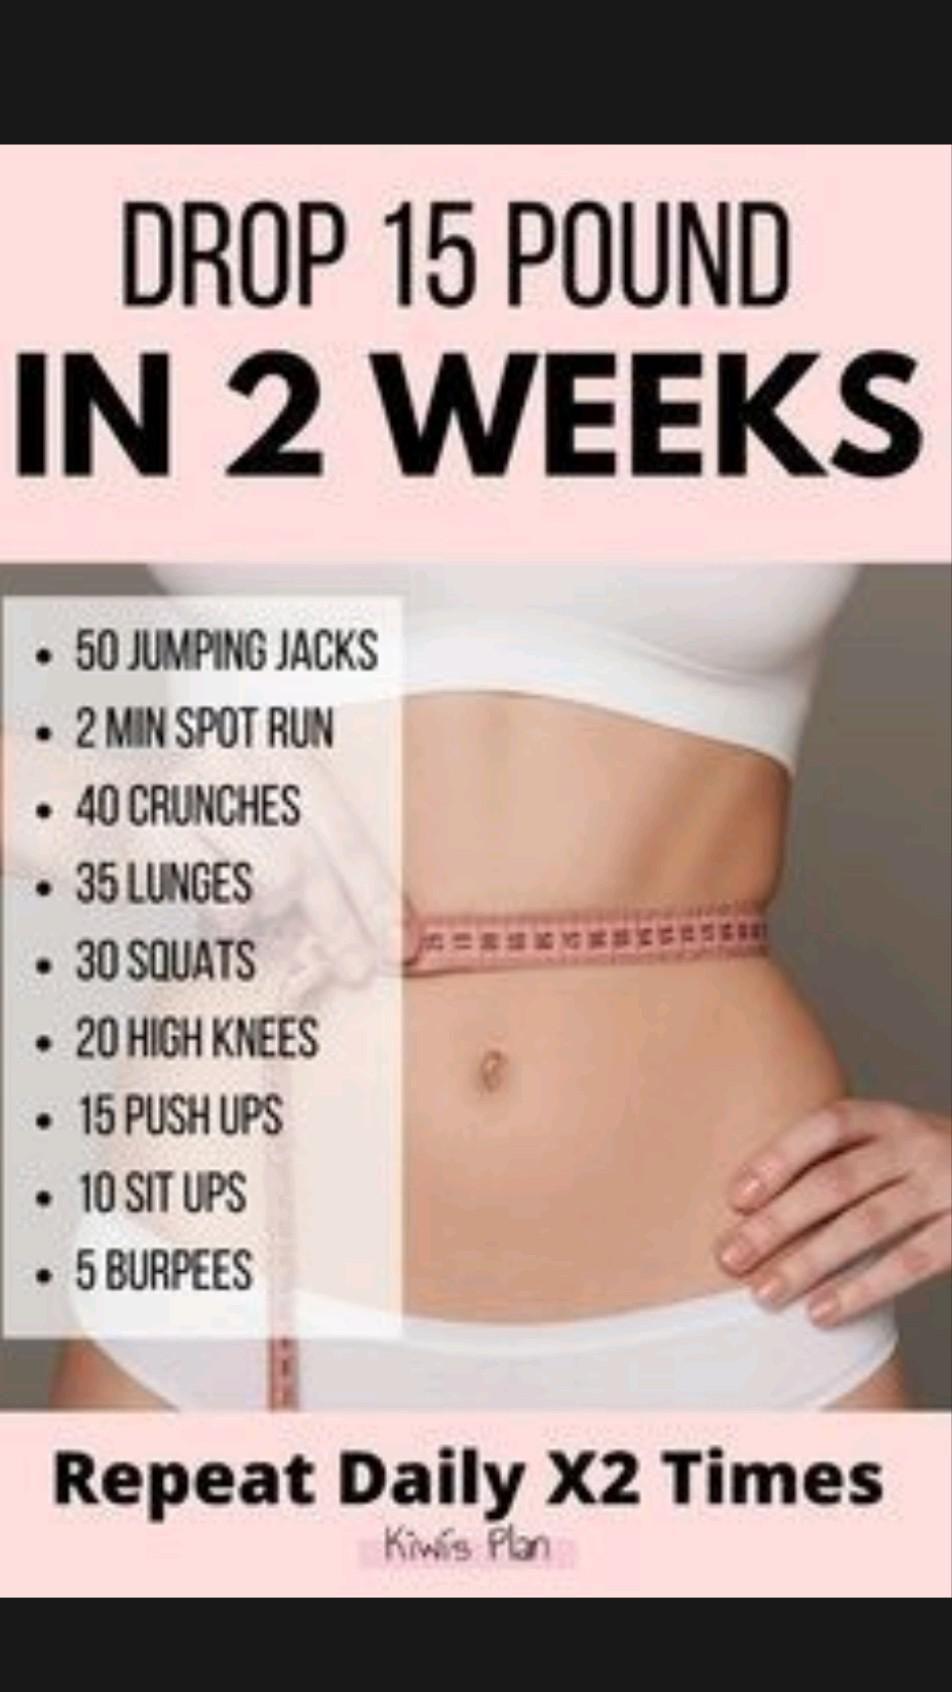 in 2 weeks drop 15 pound